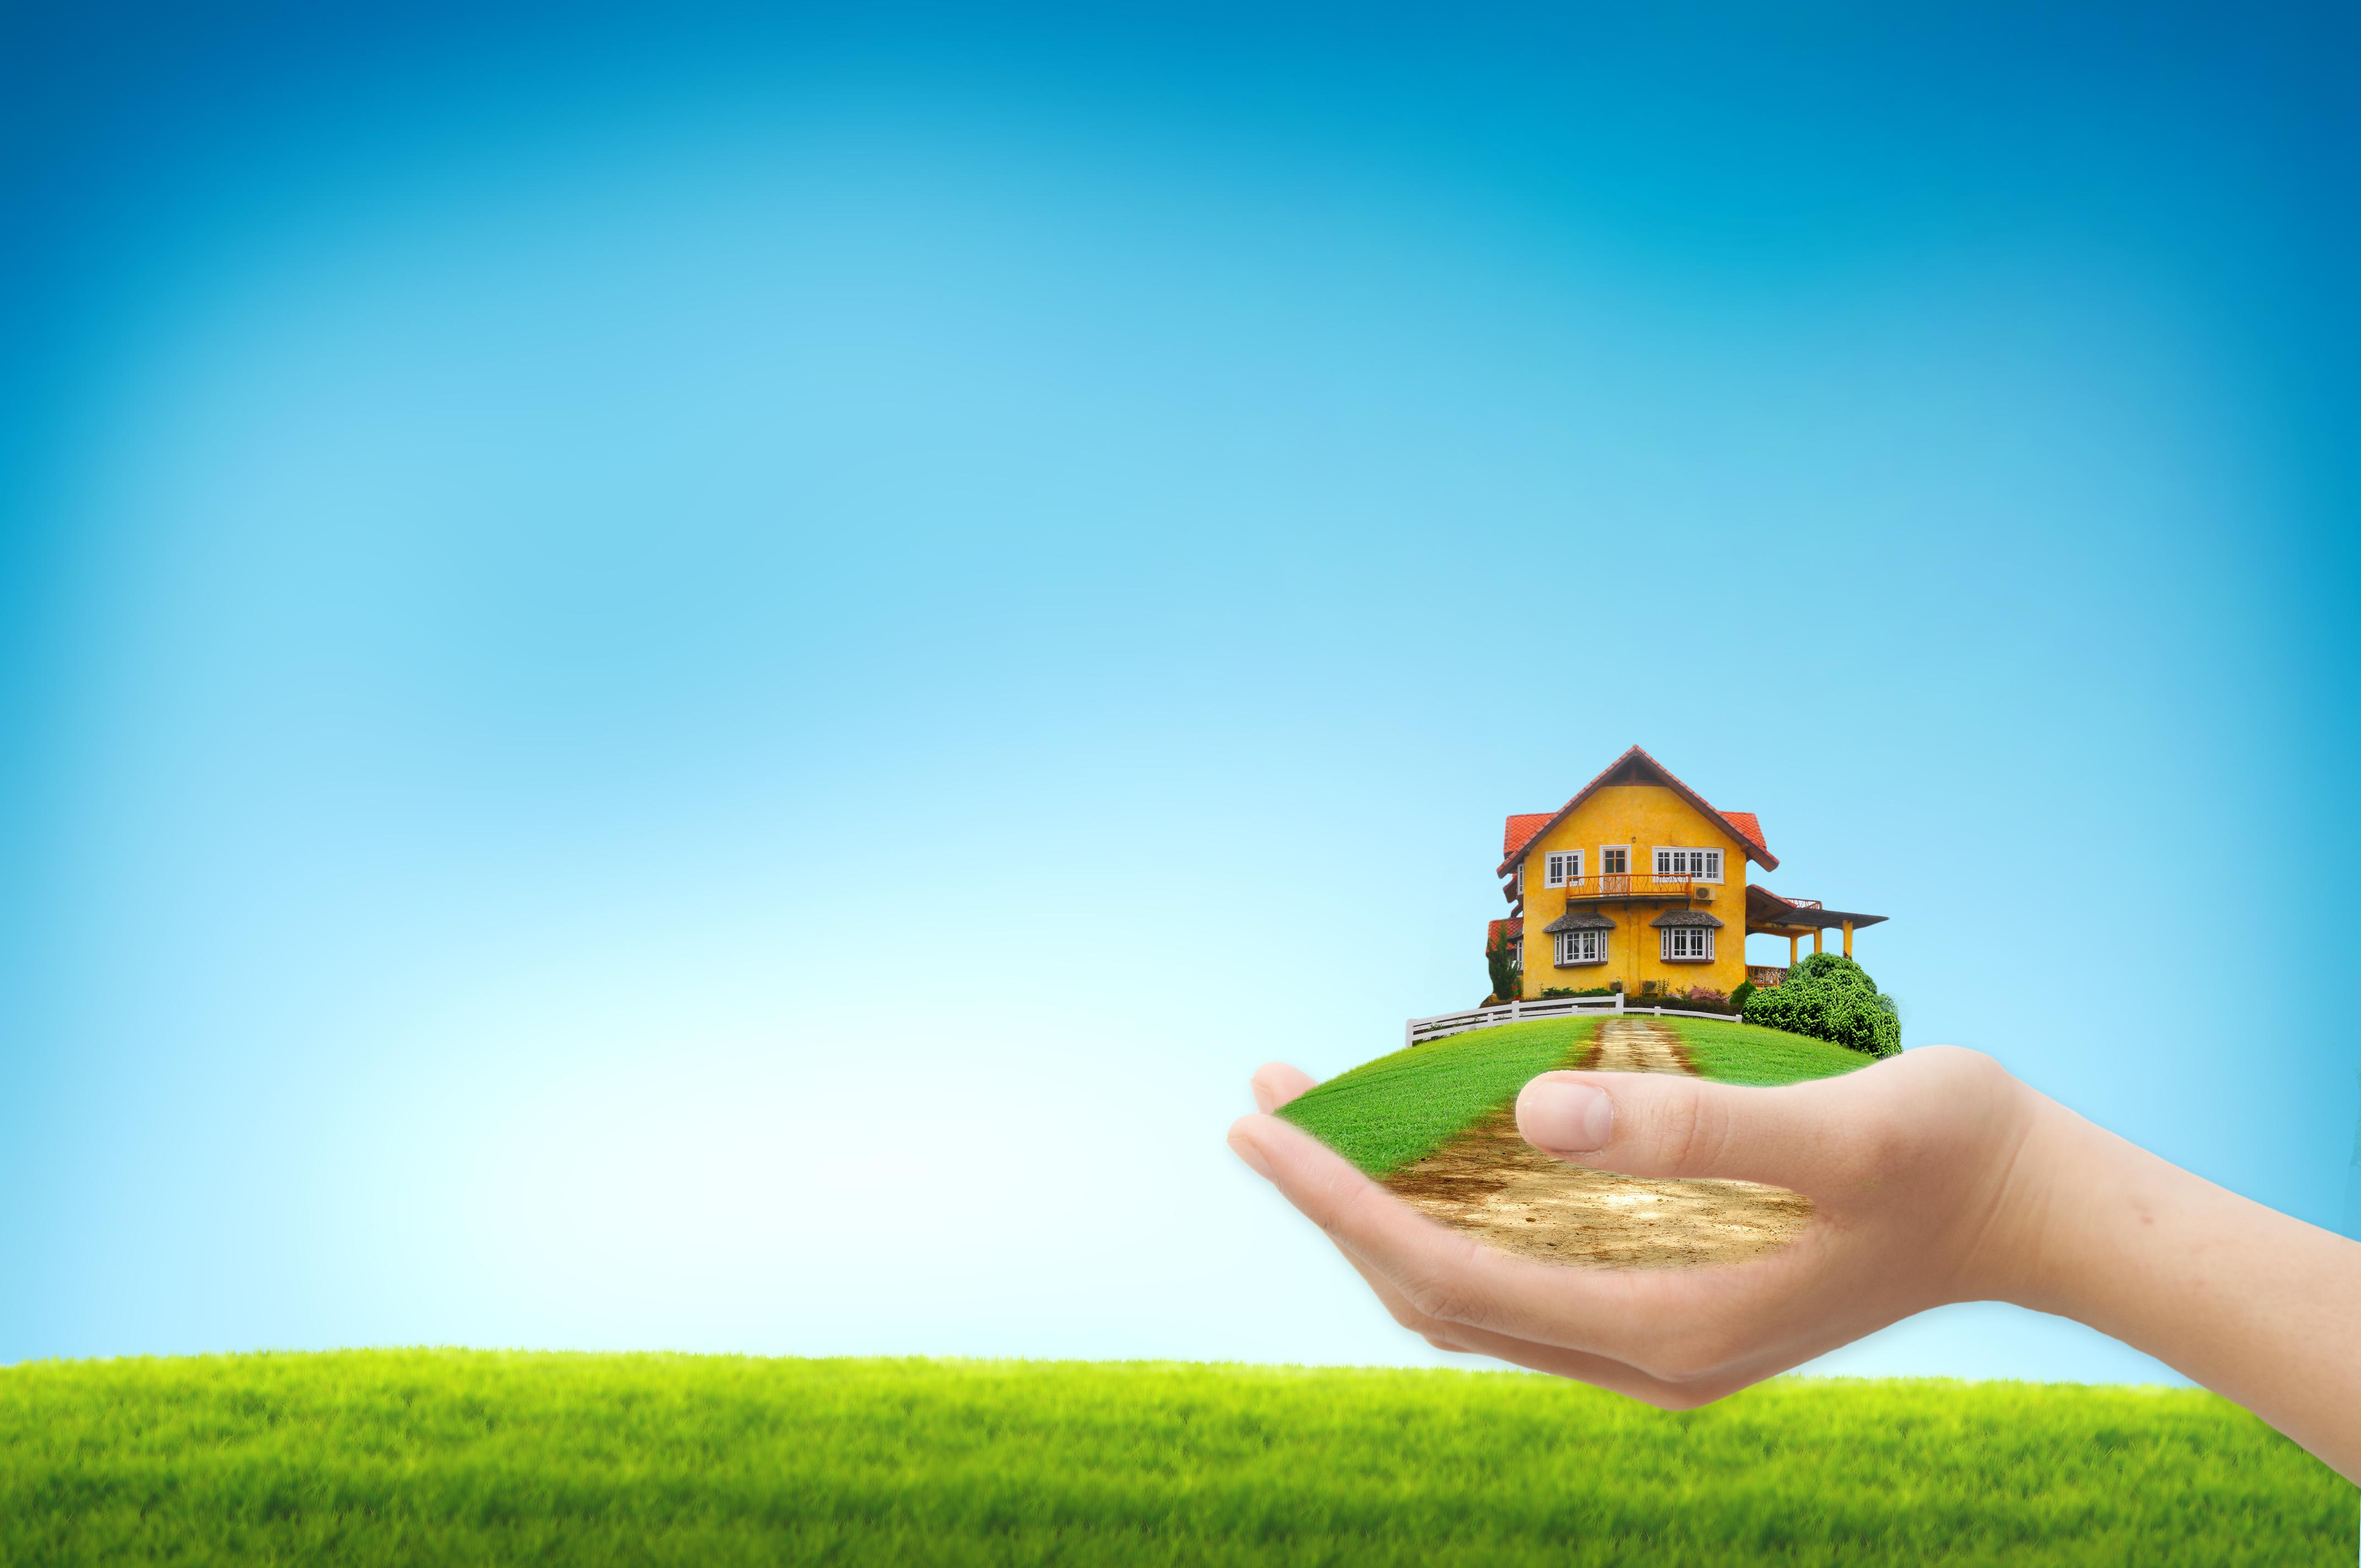 Возникновение права собственности на землю в РФ